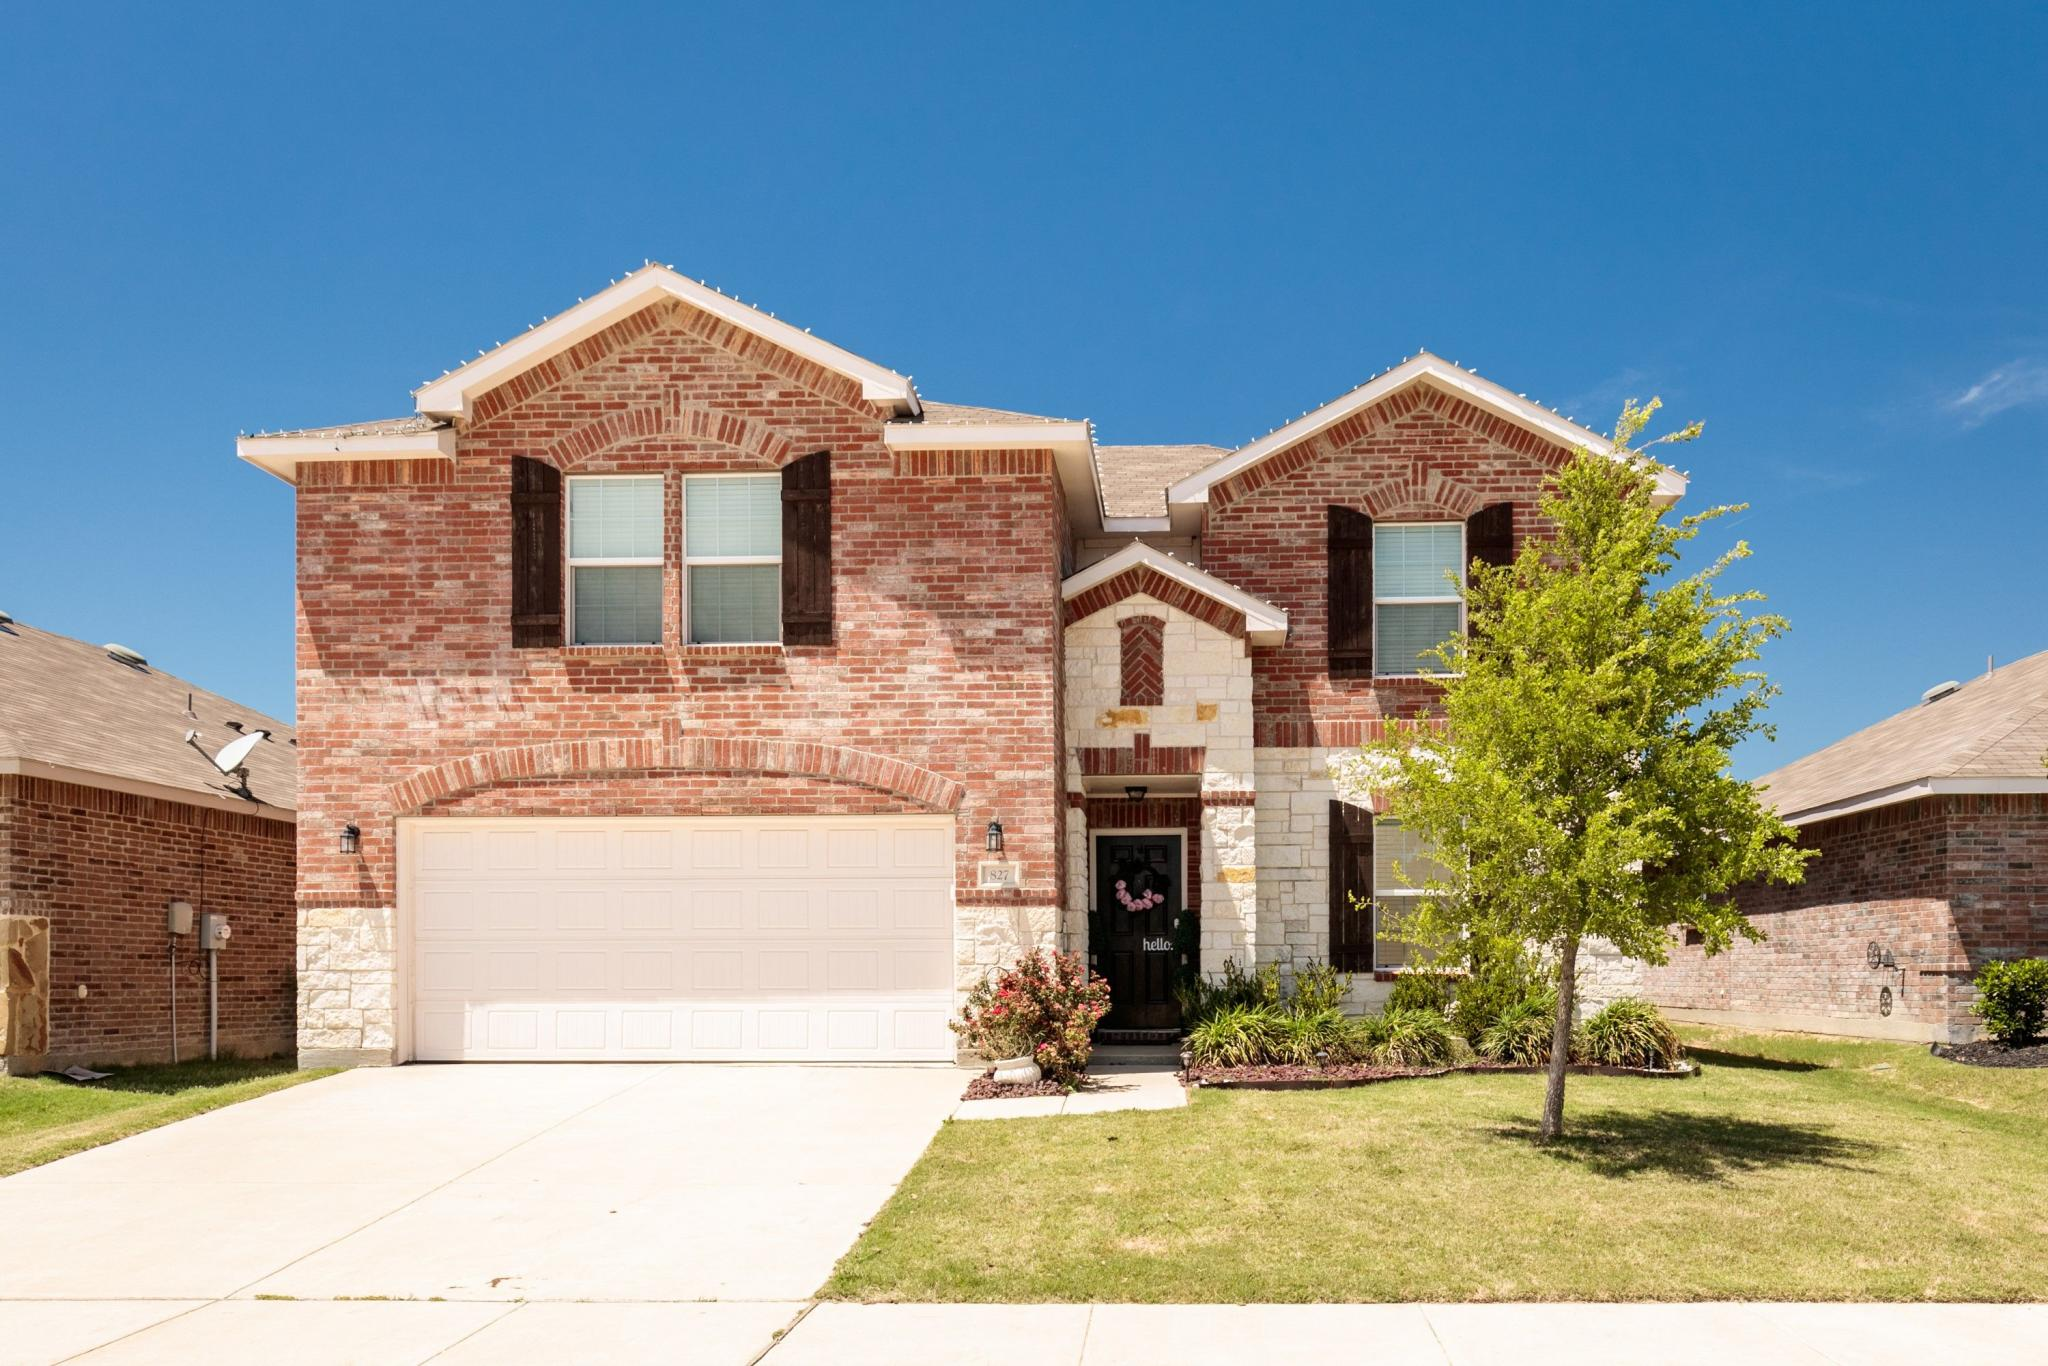 827 Underhill Dr Arlington TX Estimate and Home Details